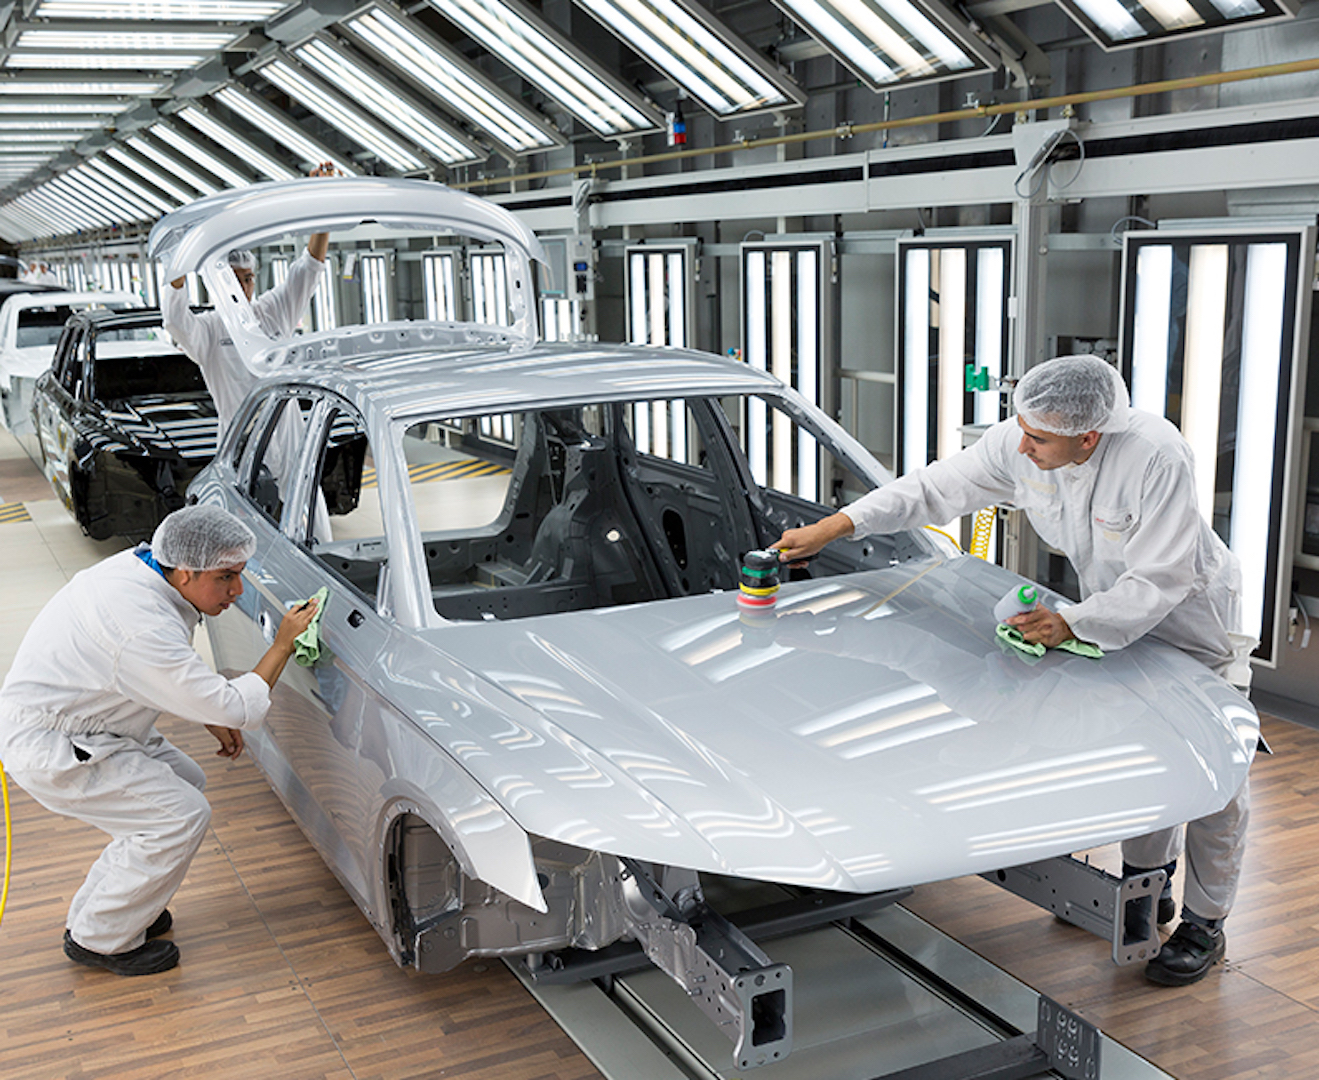 Audi / Industria automotriz / @AudideMexico